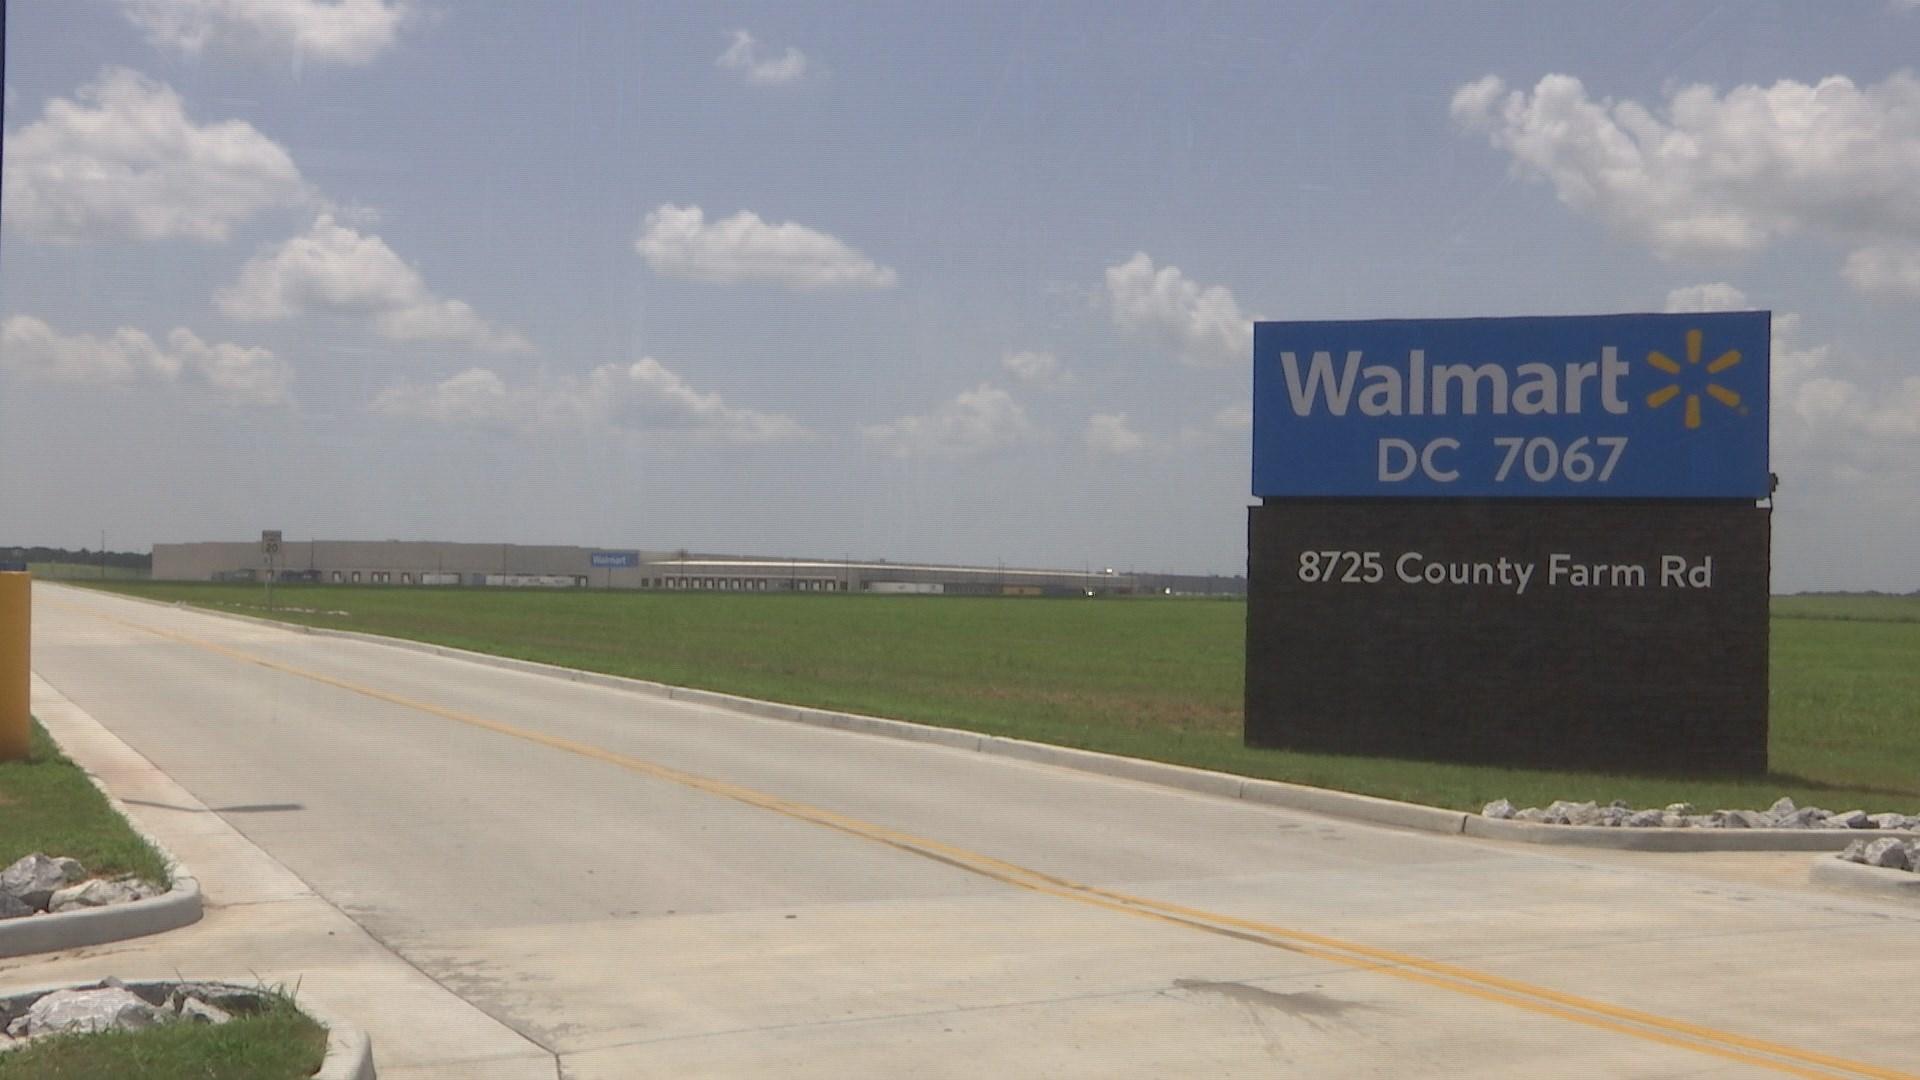 Walmart distribution center opens in Irvington (FOX10 News)